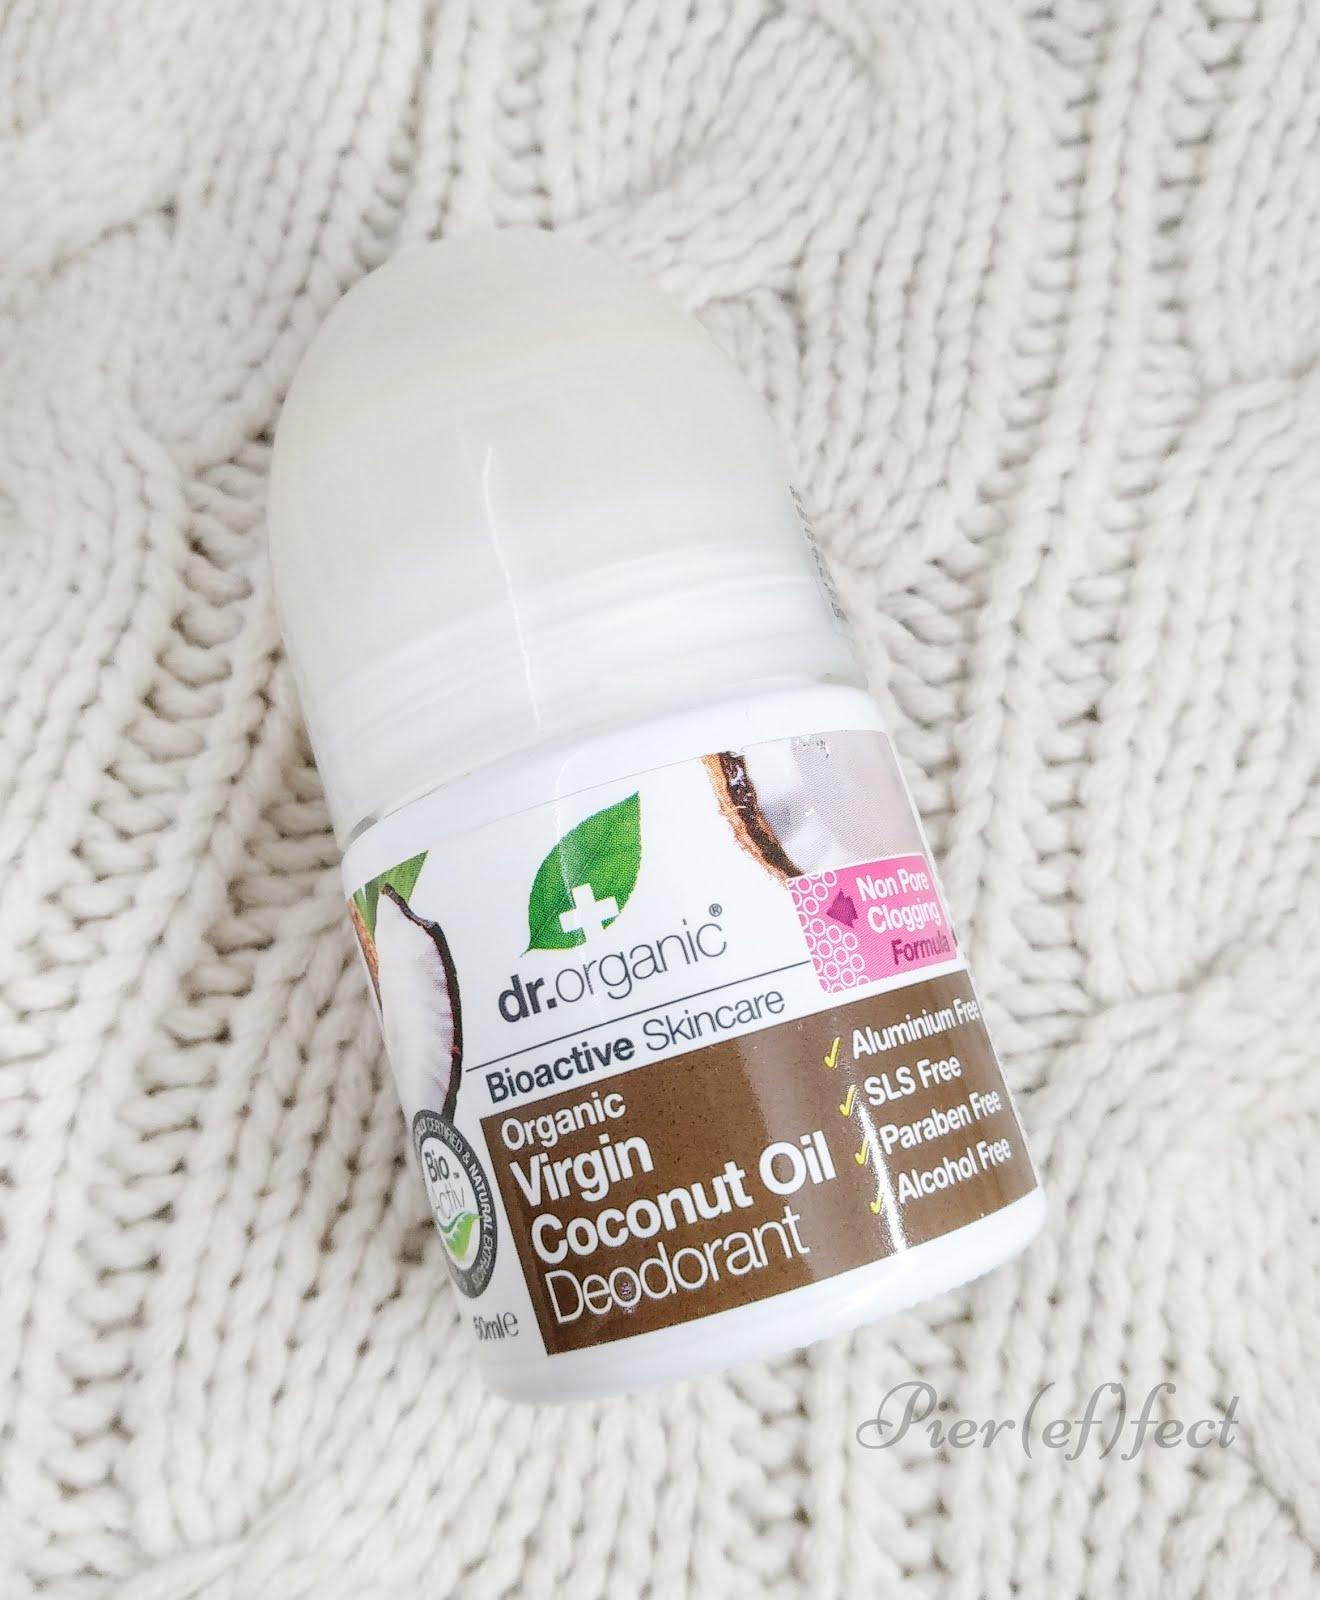 Organic Virgin Coconut Oil Deodorant Dr Organic